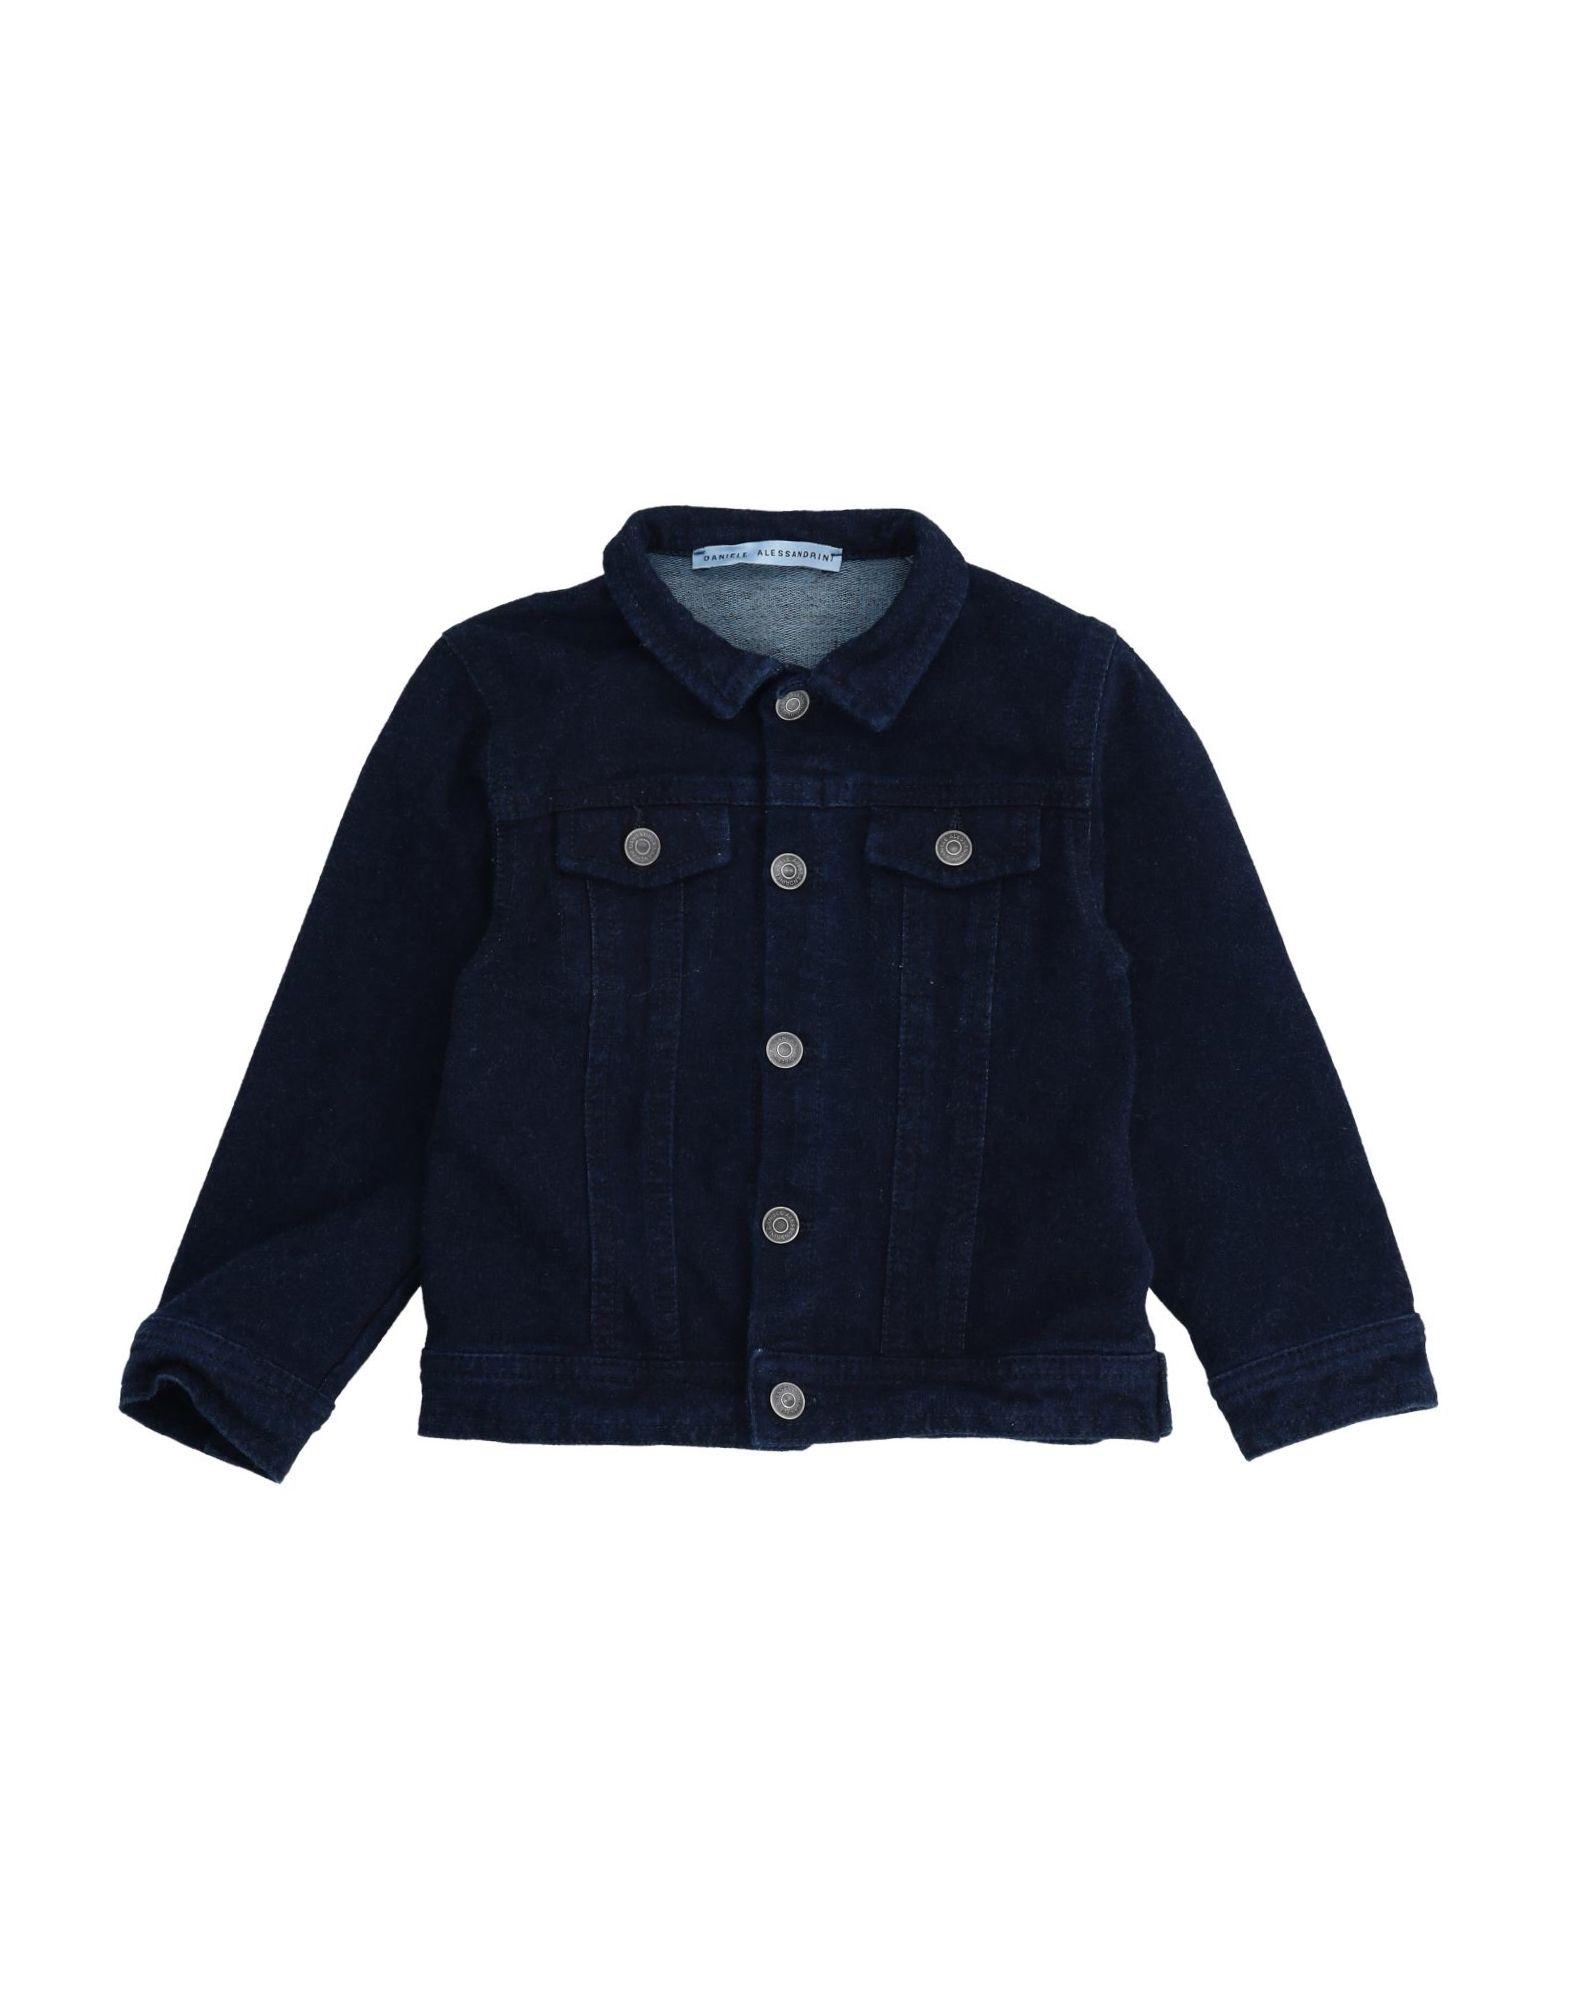 DANIELE ALESSANDRINI Джинсовая верхняя одежда daniele alessandrini homme джинсовая верхняя одежда